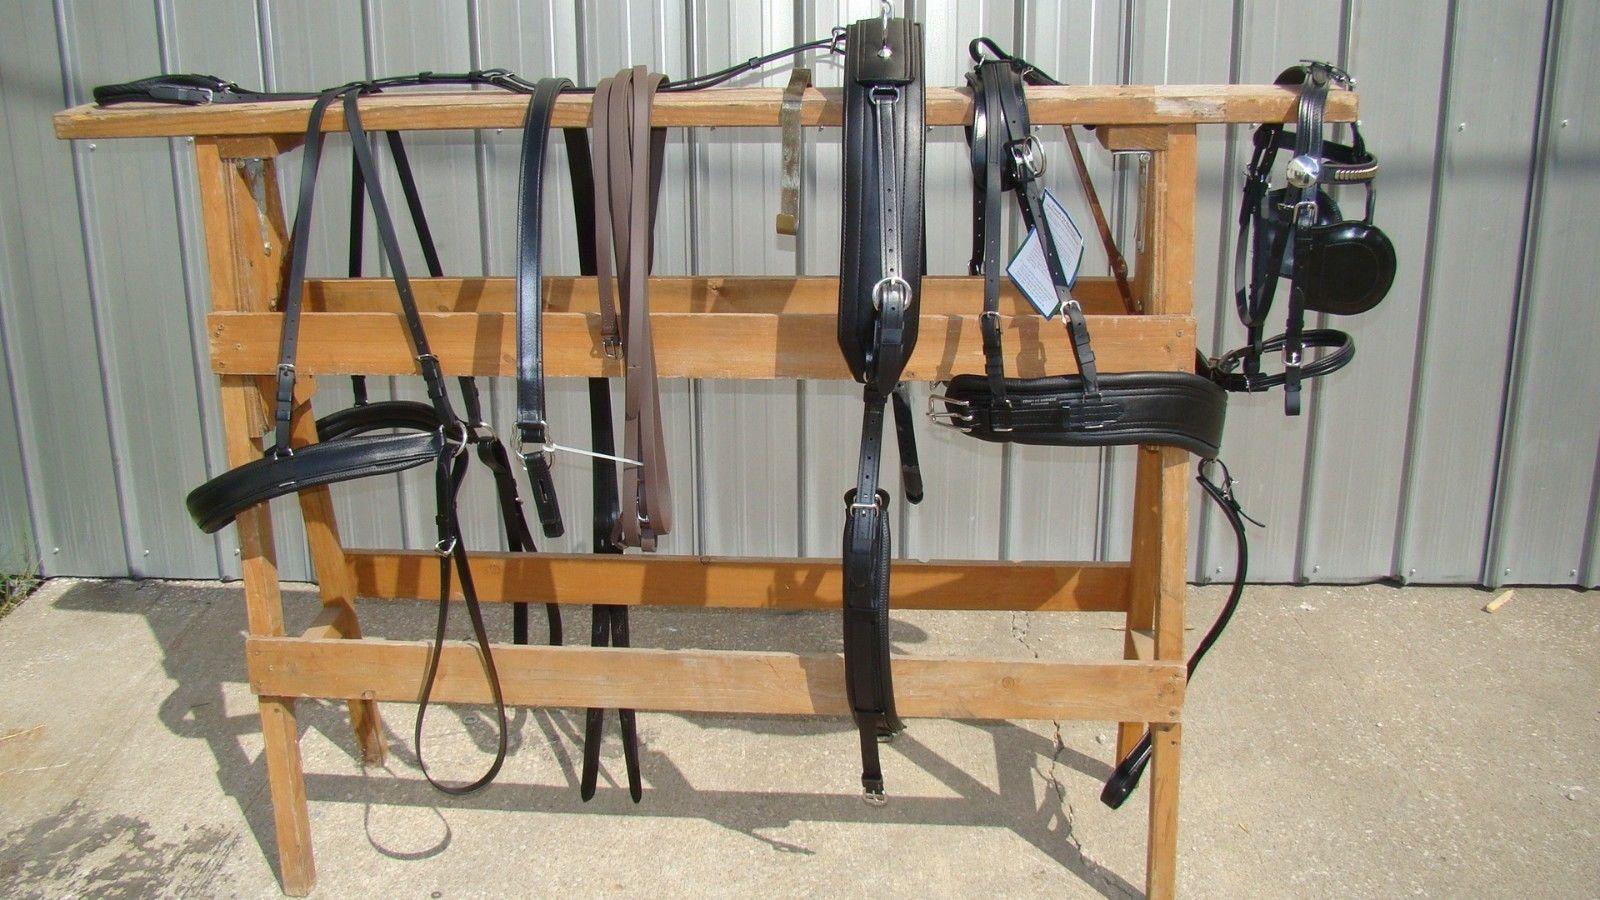 comfyhorsestandard1a?resize=400%2C400&ssl=1 comfy fit marathon harness frontier equestrian draft horse saddle